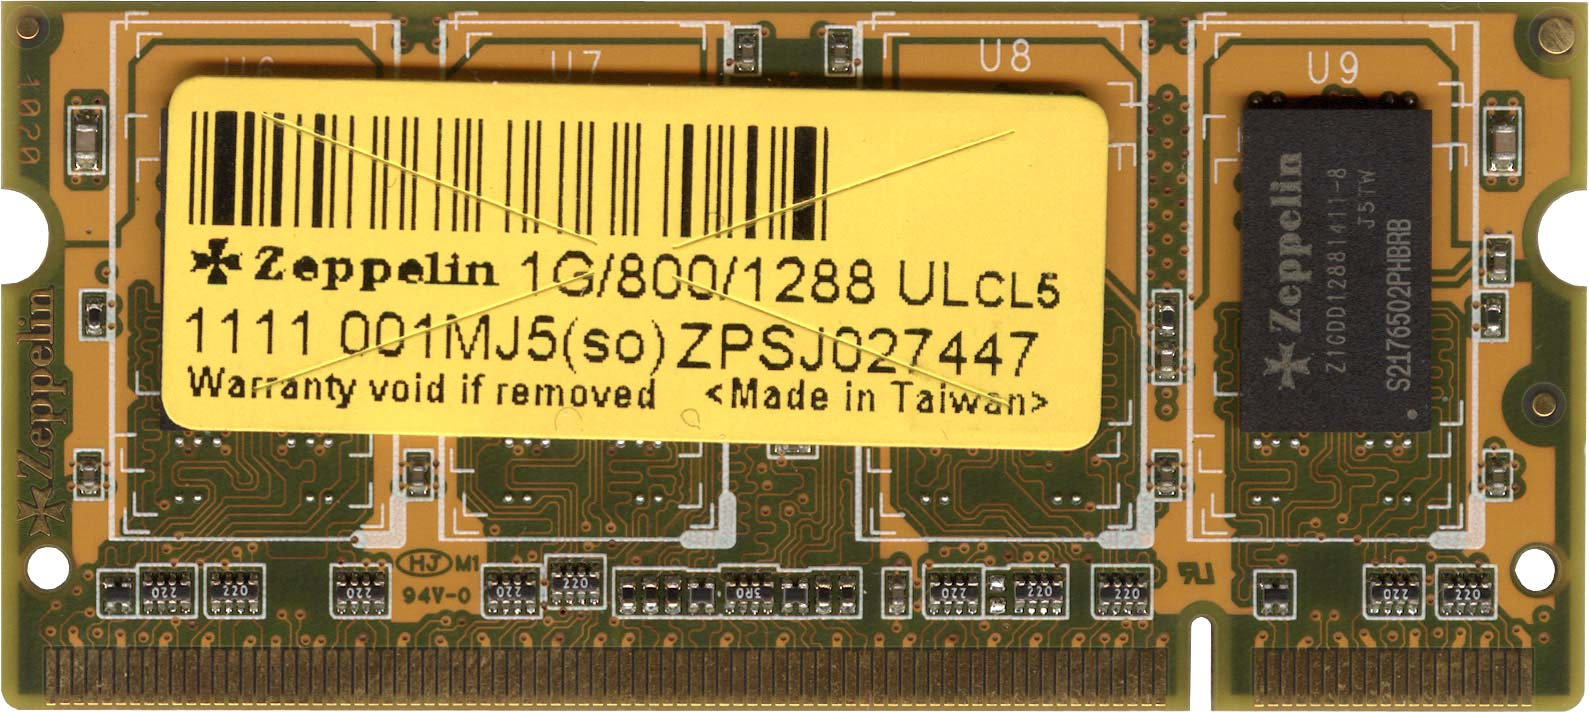 Оперативная память Zeppelin ZPSJ027447 - 1G/800/1288 ULcL5